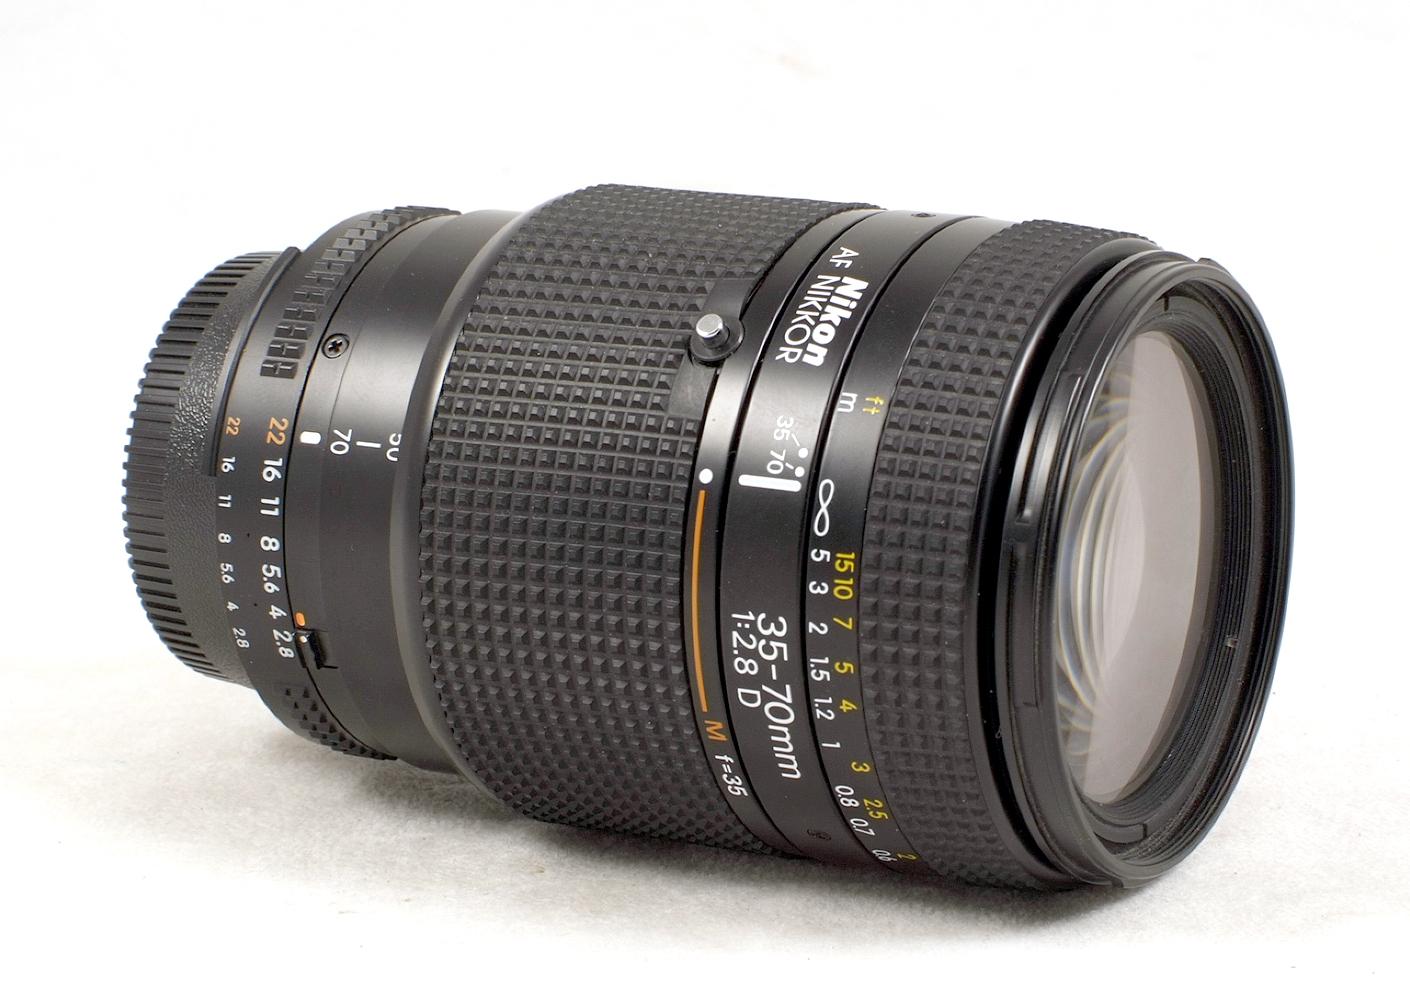 Lot 39 - Nikon 35-70mm f2.8 D Auto-Focus Zoom Lens. #806071.